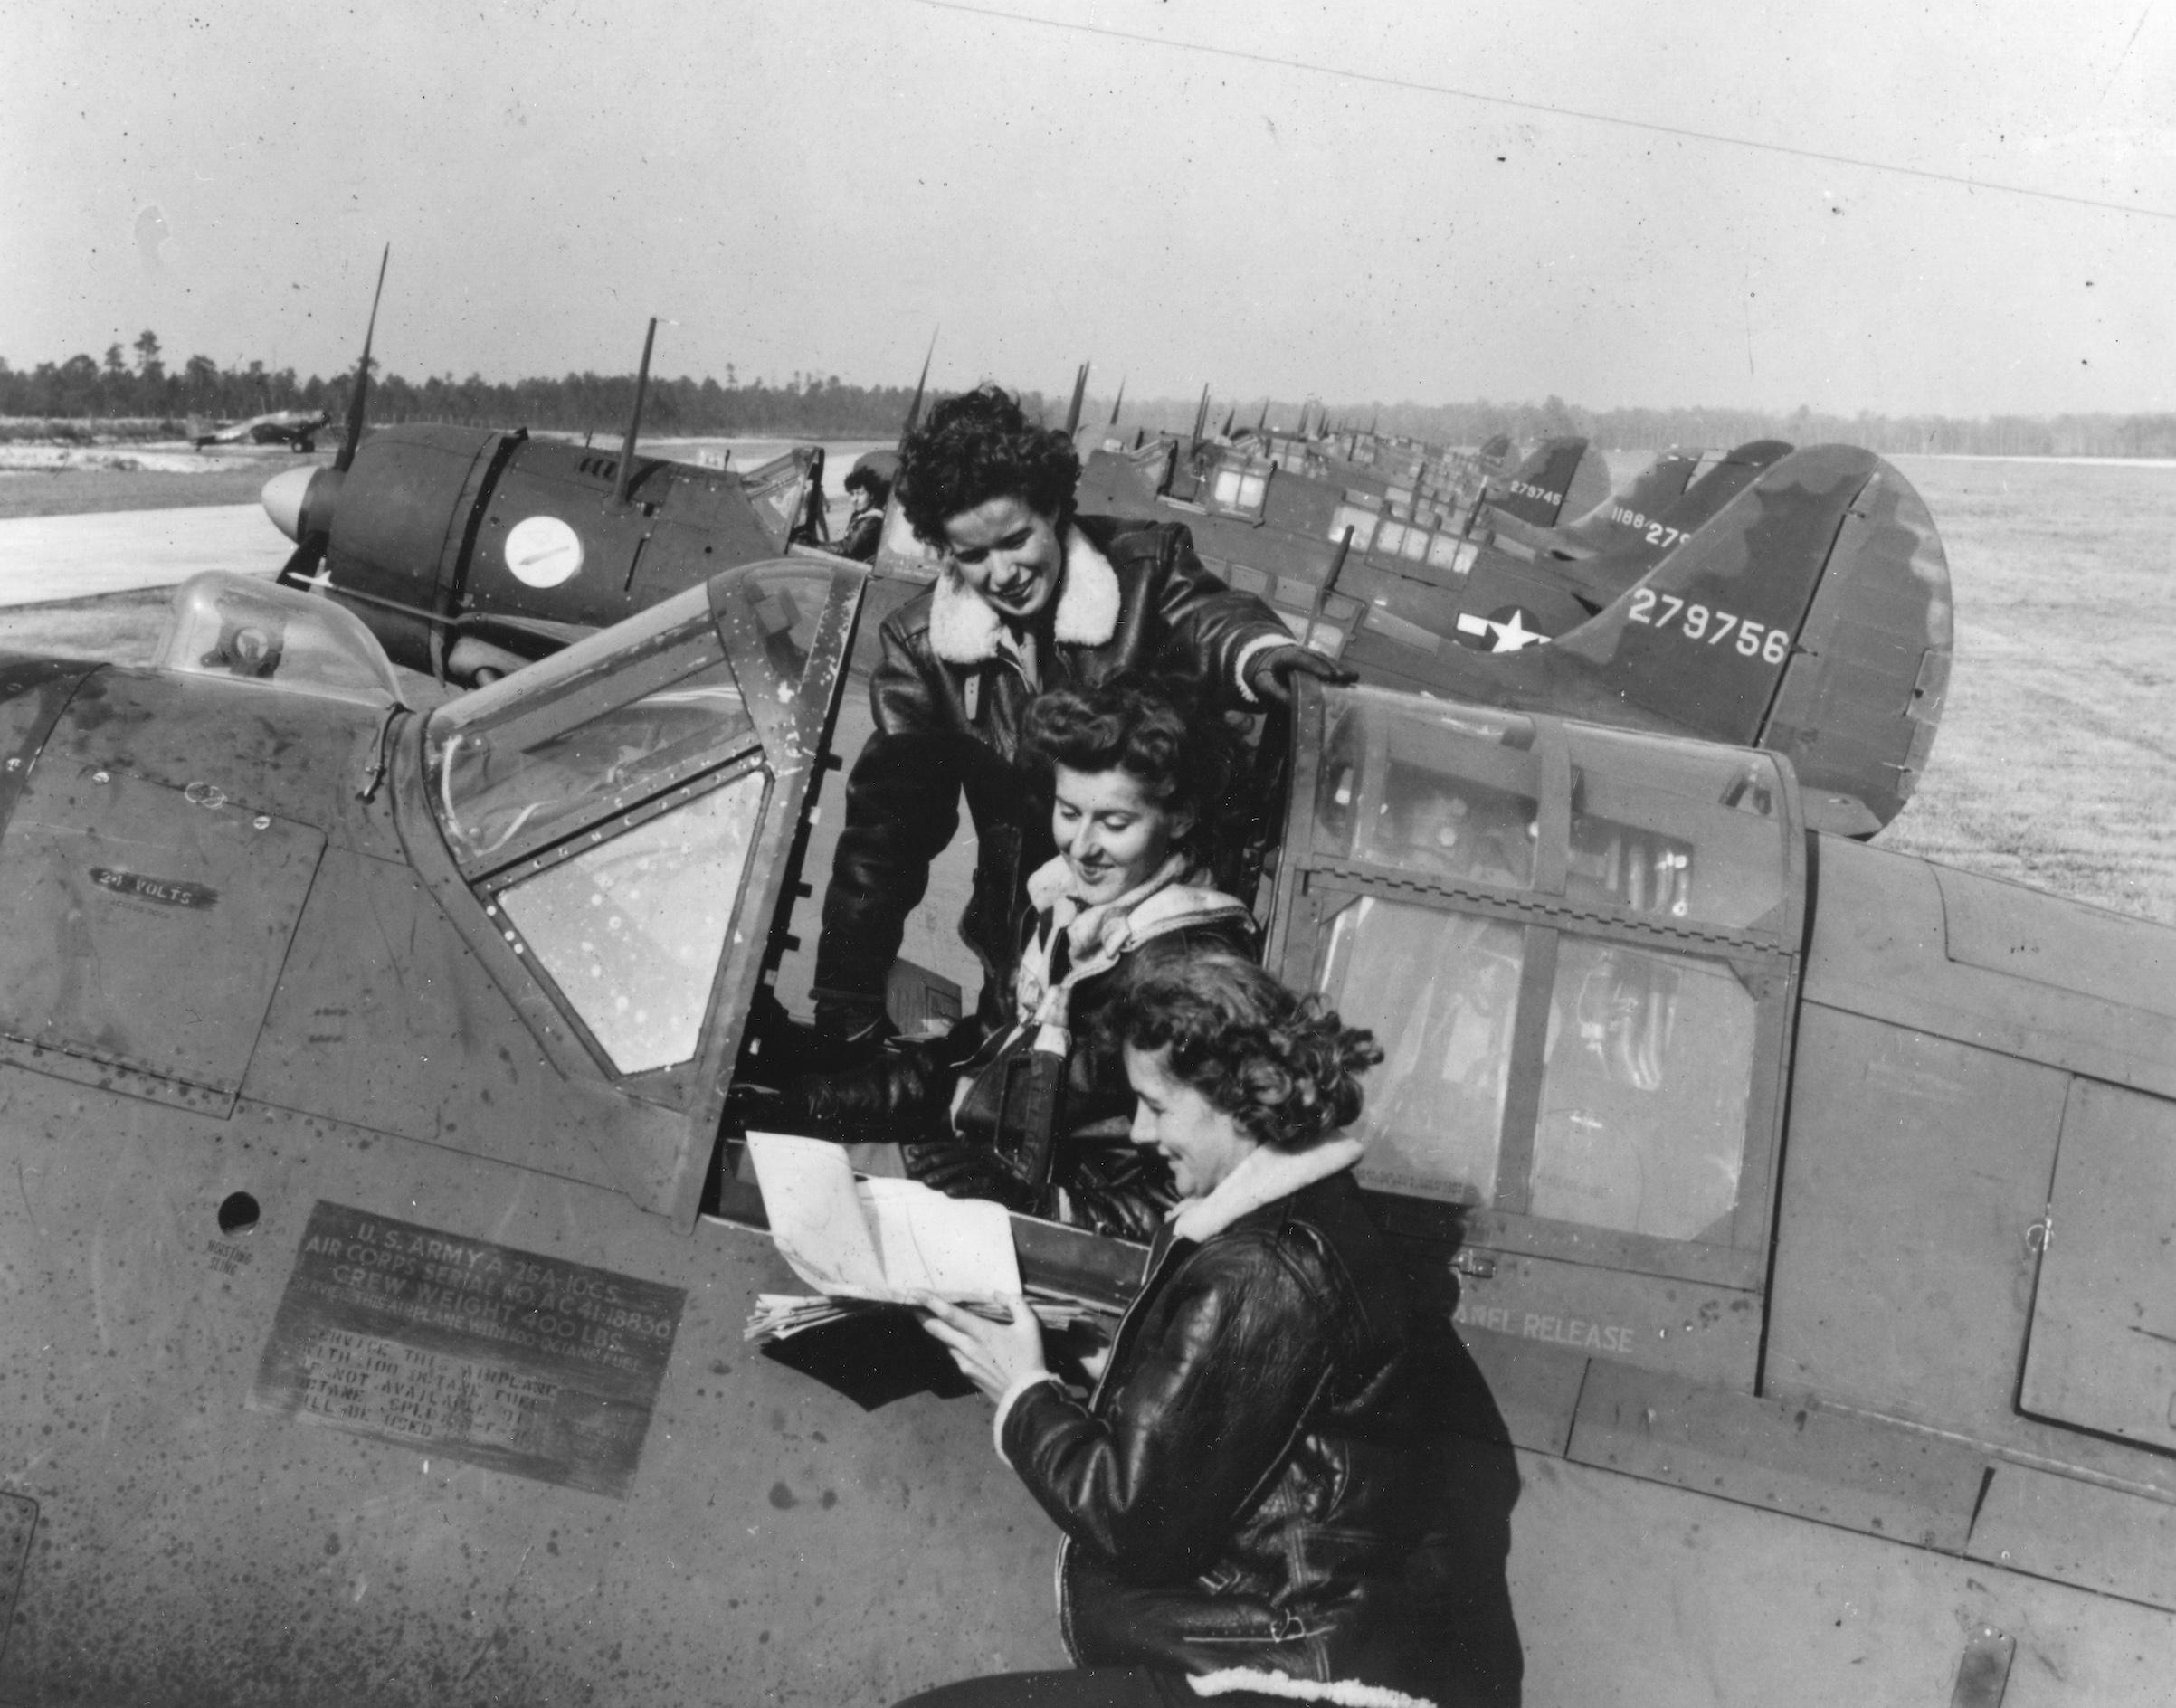 A trio of WASP around a Curtiss A-25A making last minute check-ups before taking off. Army Air Field Camp Davis, N.C. Circa 1944.